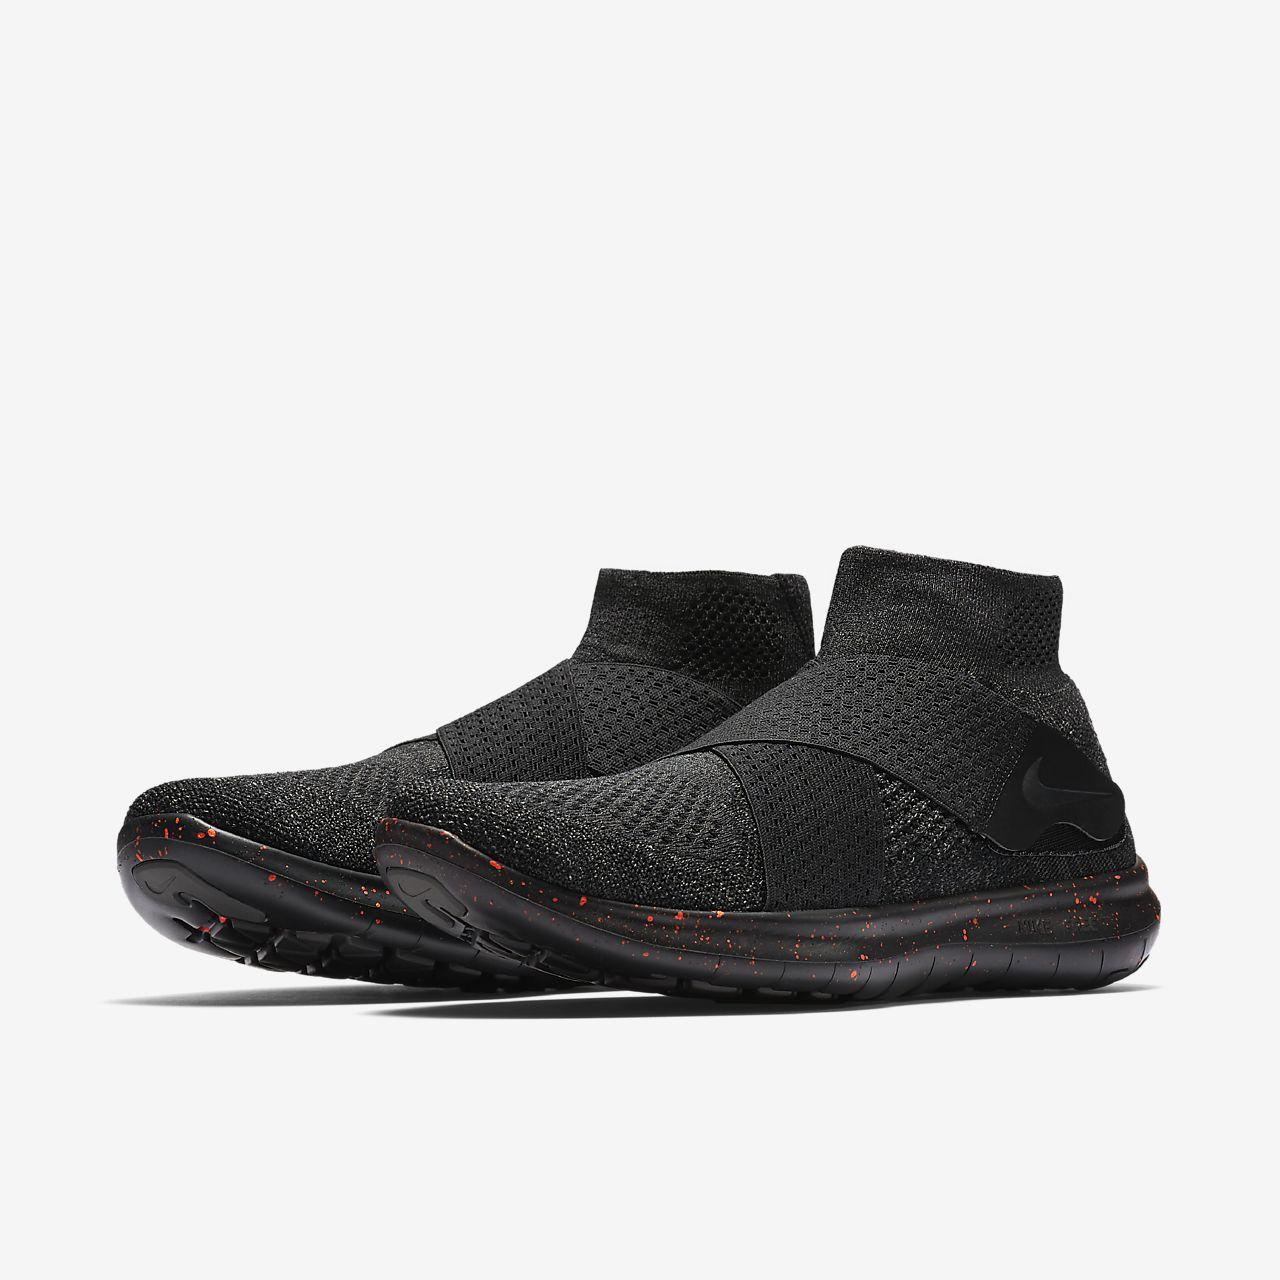 cheaper 1a8c9 fc1d9 ... NikeLab Free RN Motion Flyknit 2017 Men s Running Shoe